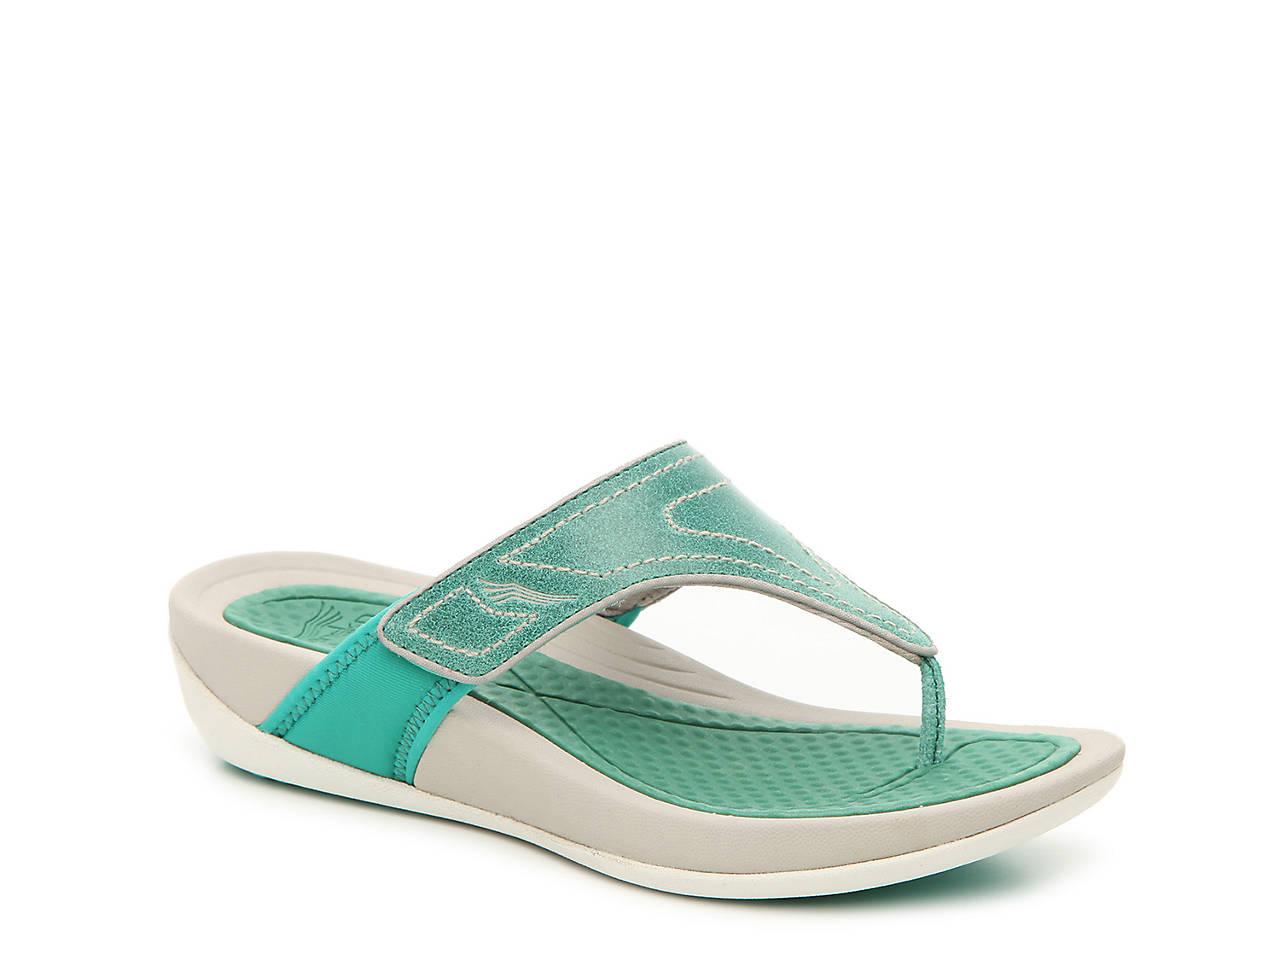 c42398d9470 Dansko Katy 2 Wedge Sandal Women s Shoes